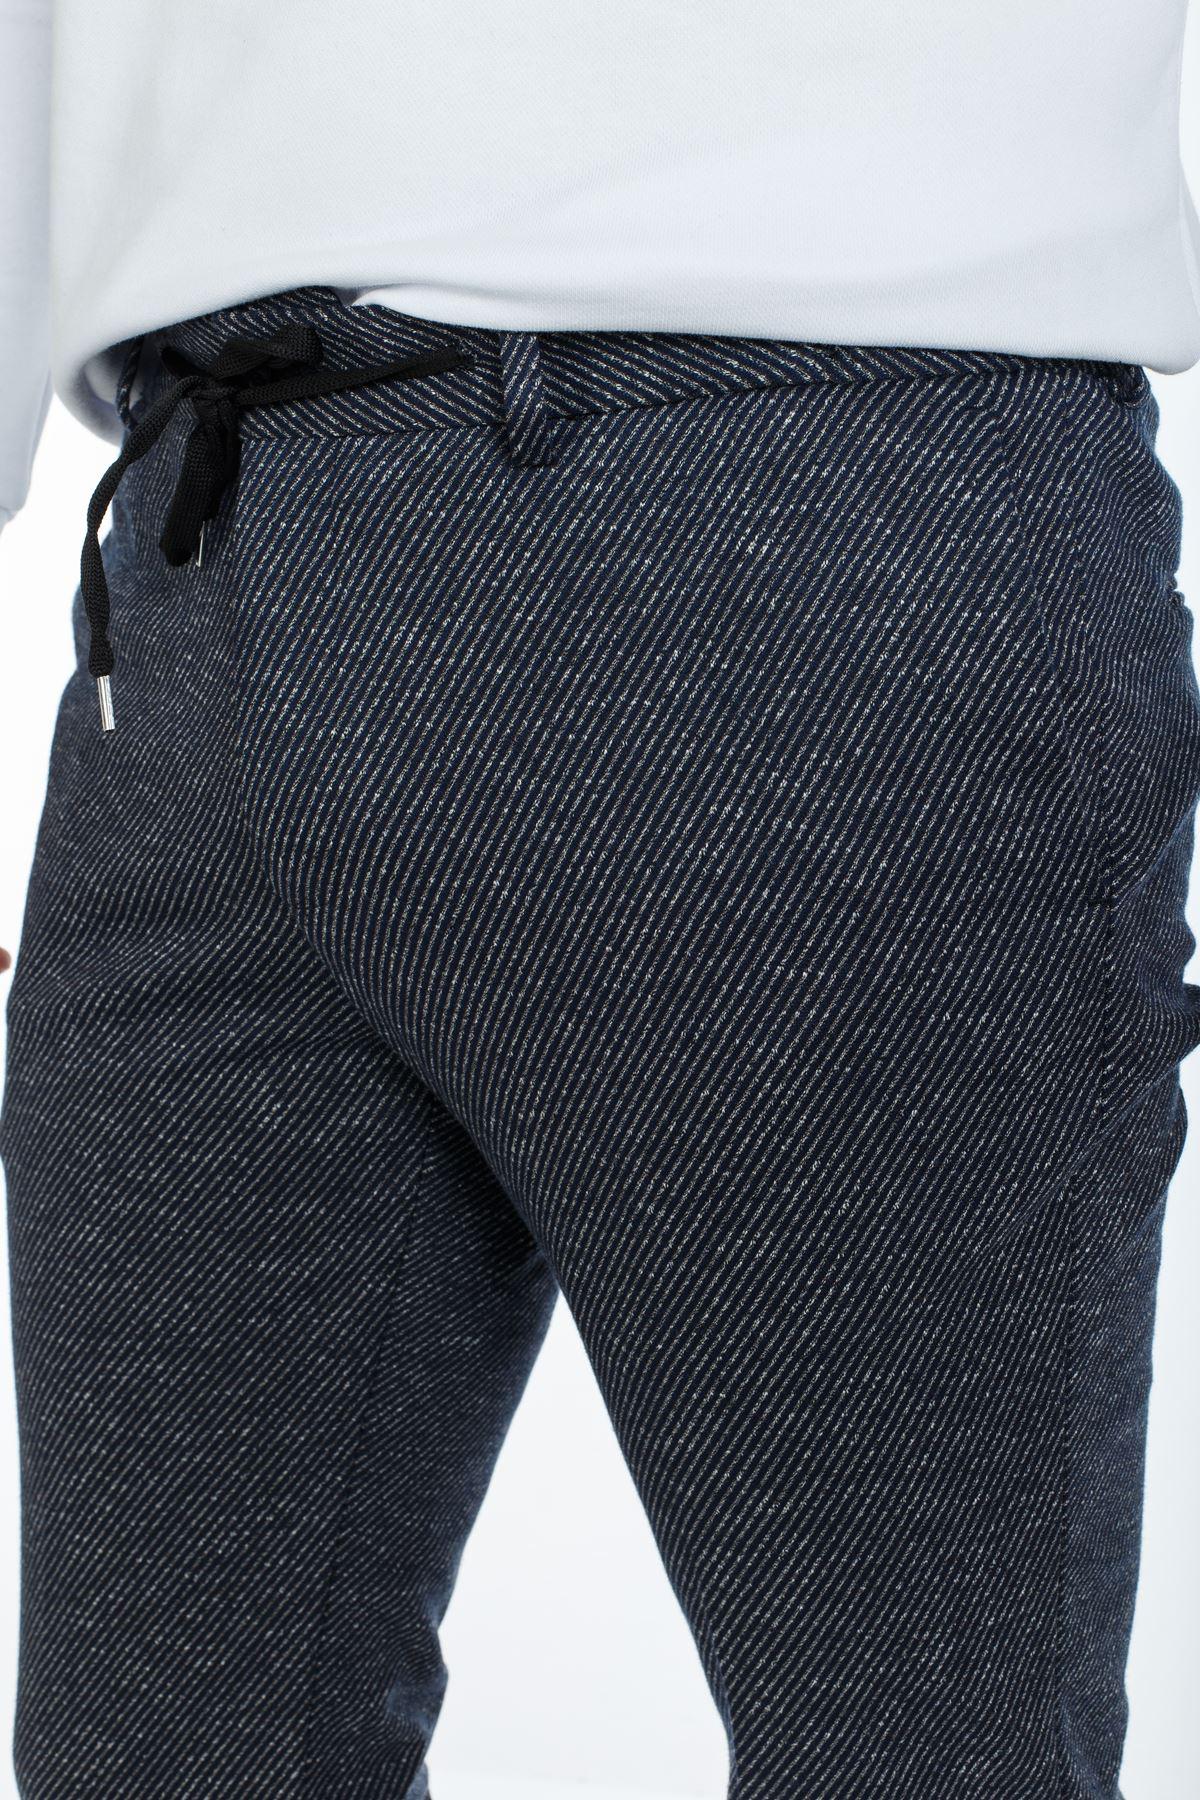 Lacivert Desenli Süper Slim Kalıp Jogger Pantolon